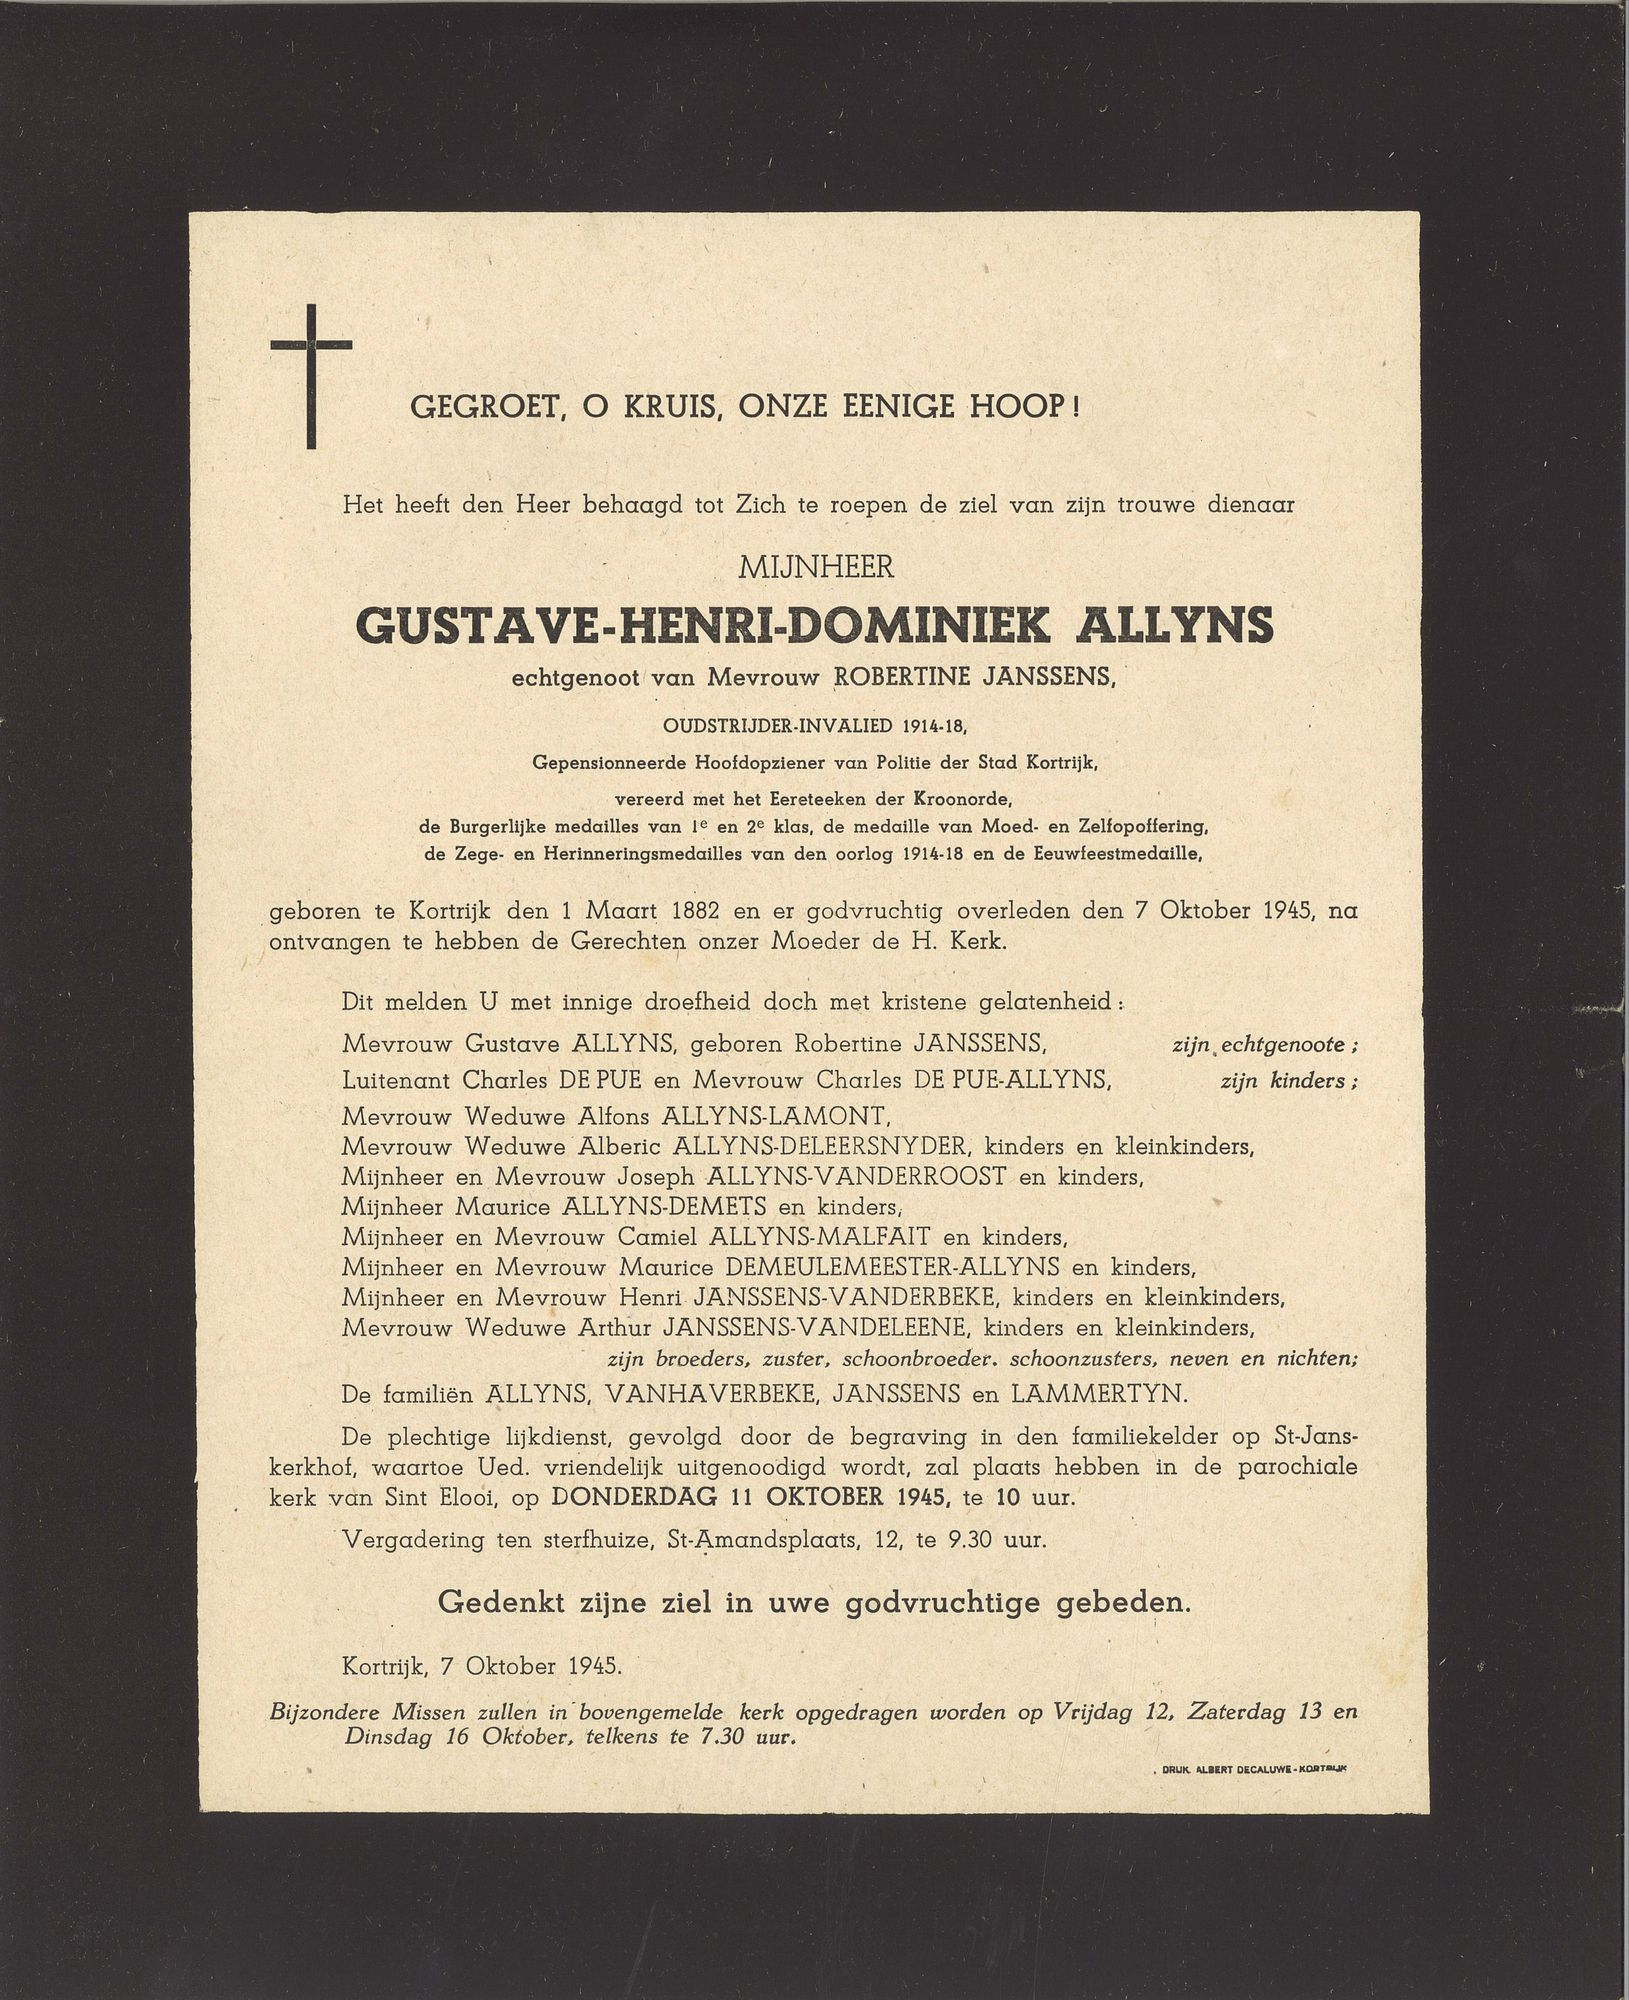 Gustave-Henri-Dominiek Allyns